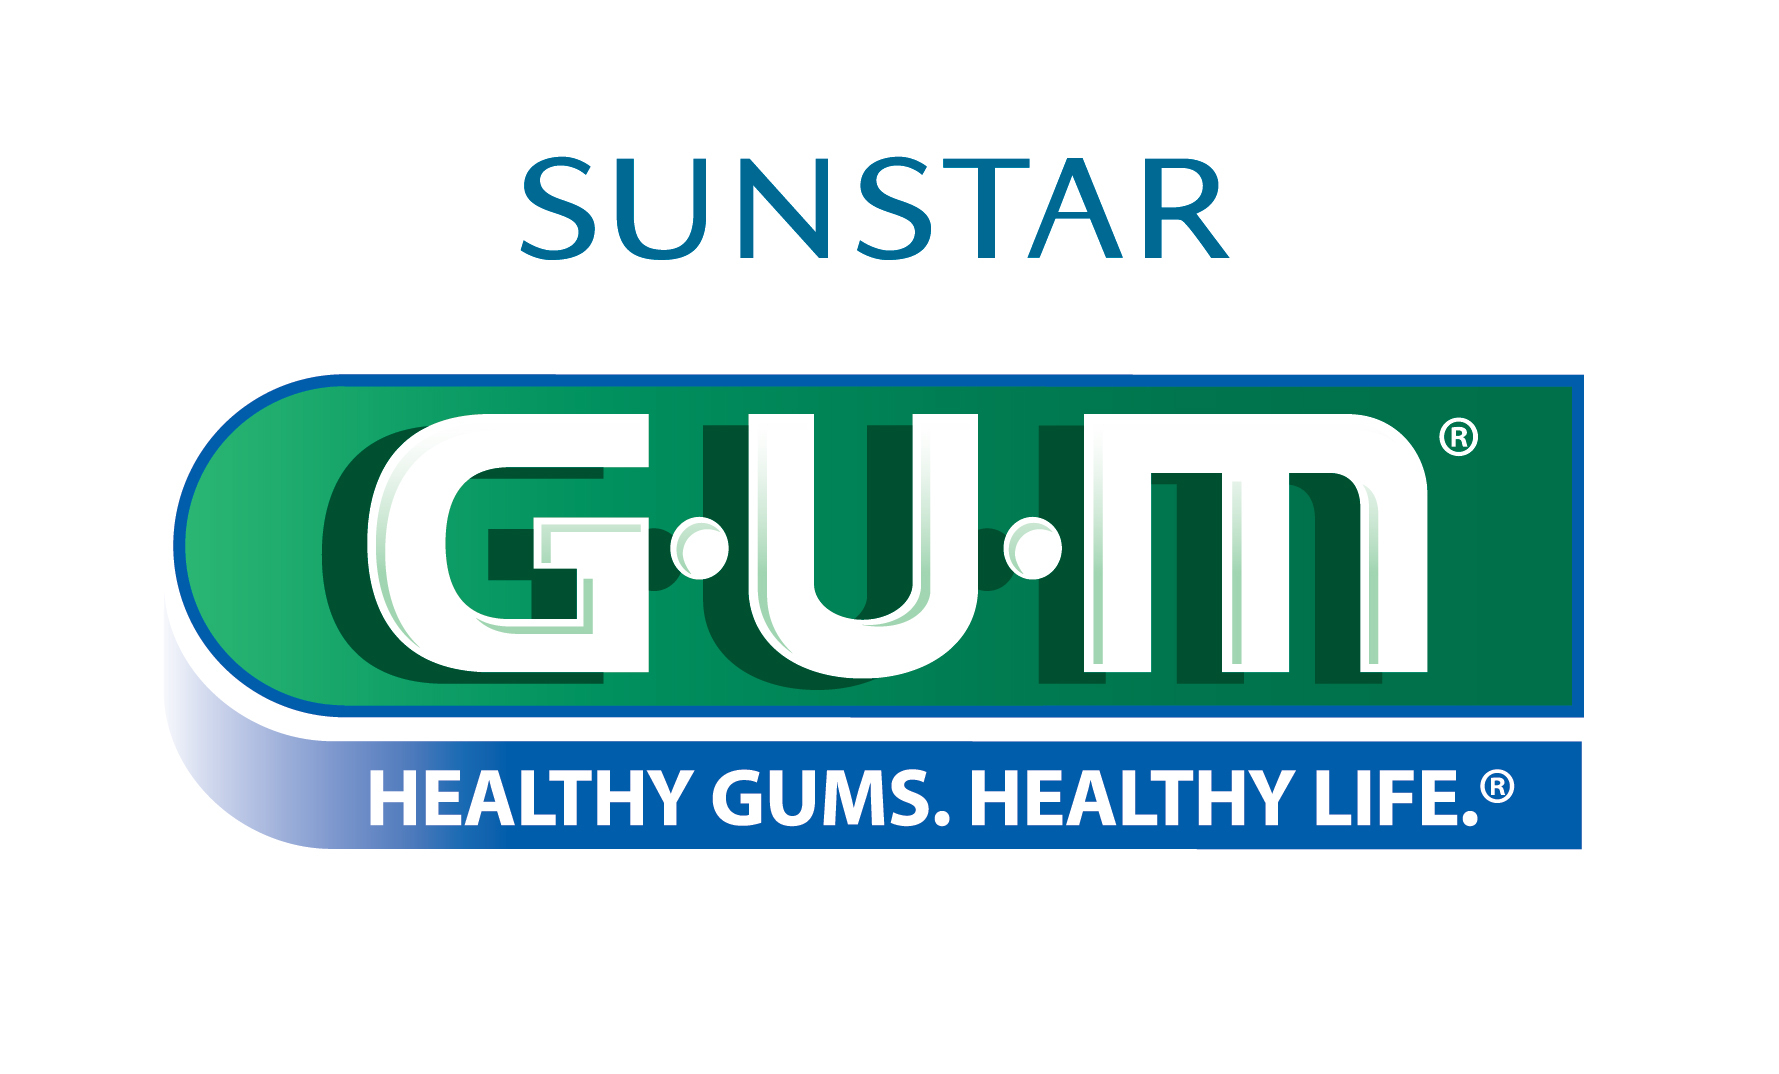 gum_coupons